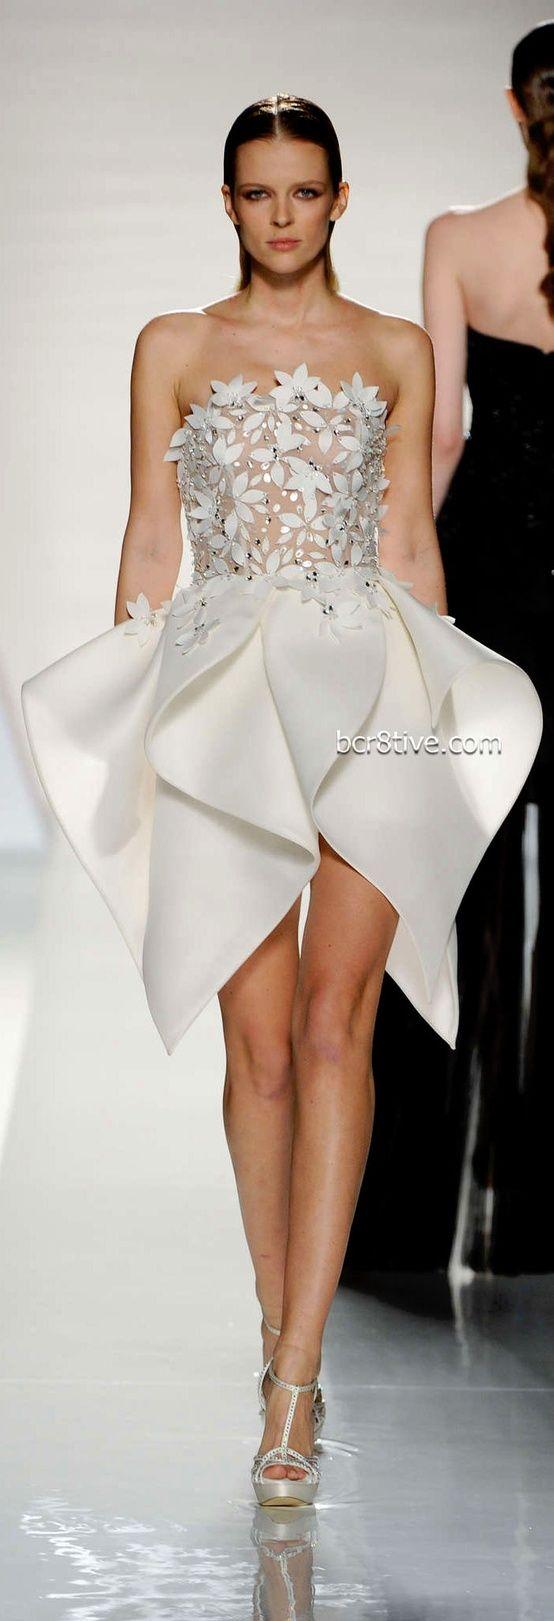 Fausto Sarli Spring Summer 2012 Couture<3